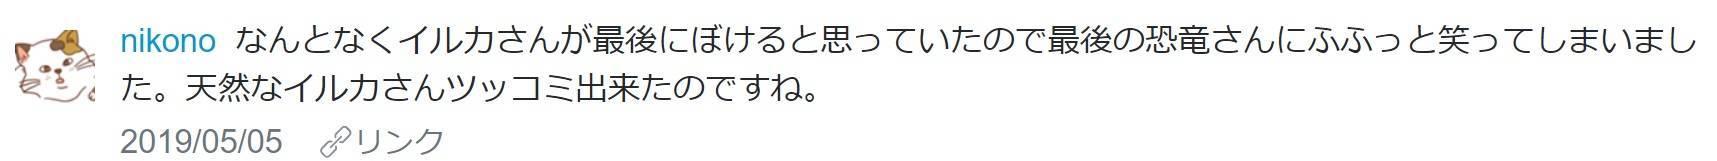 f:id:shiro_iruka:20190505233439j:plain